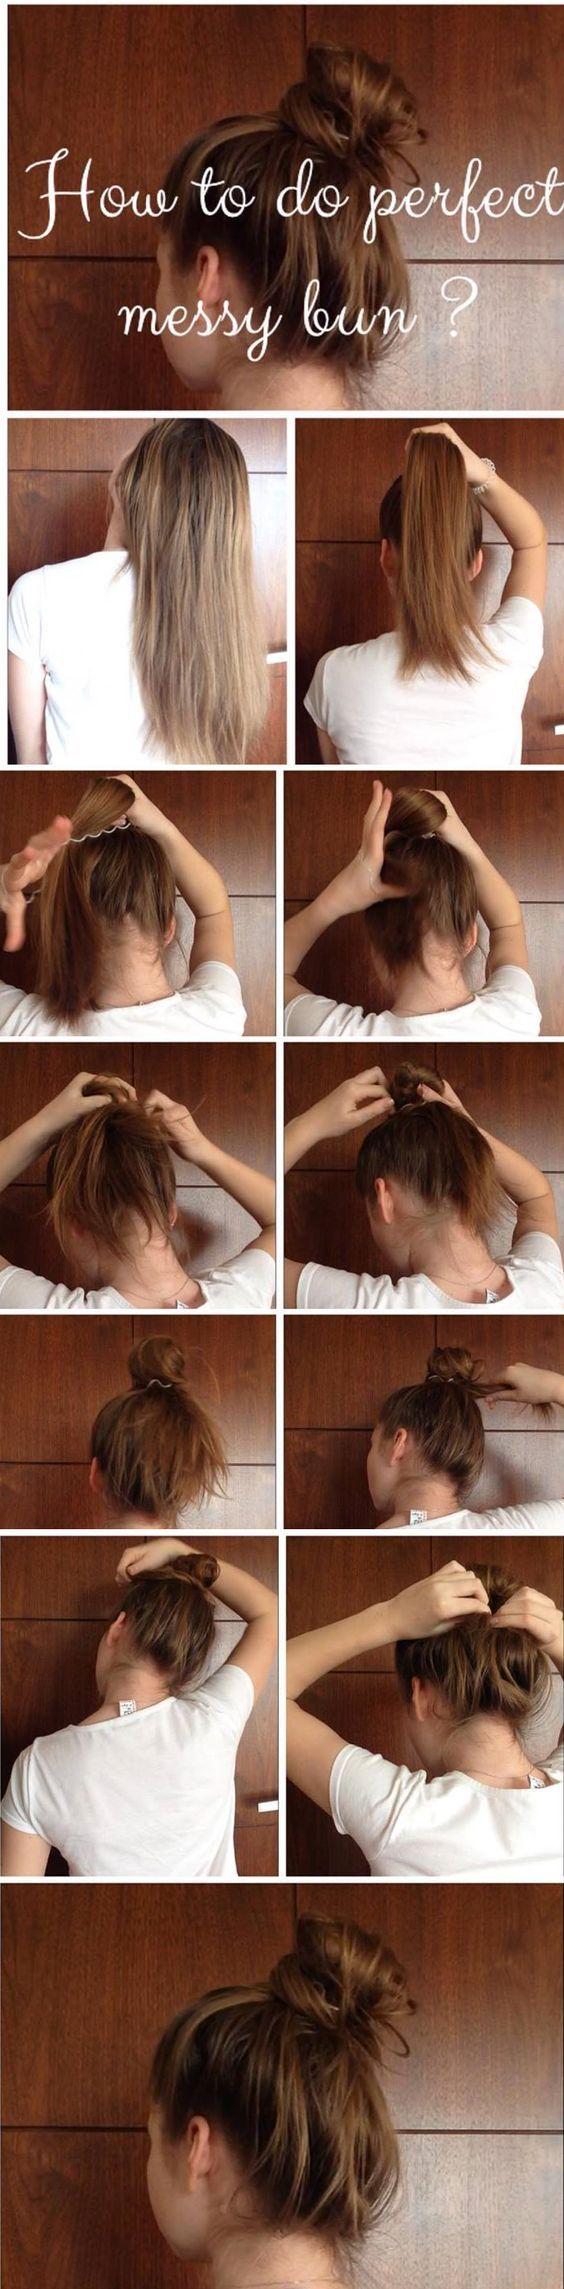 26 Amazing Bun Updo Ideas for Long & Medium Length Hair - Pretty Designs